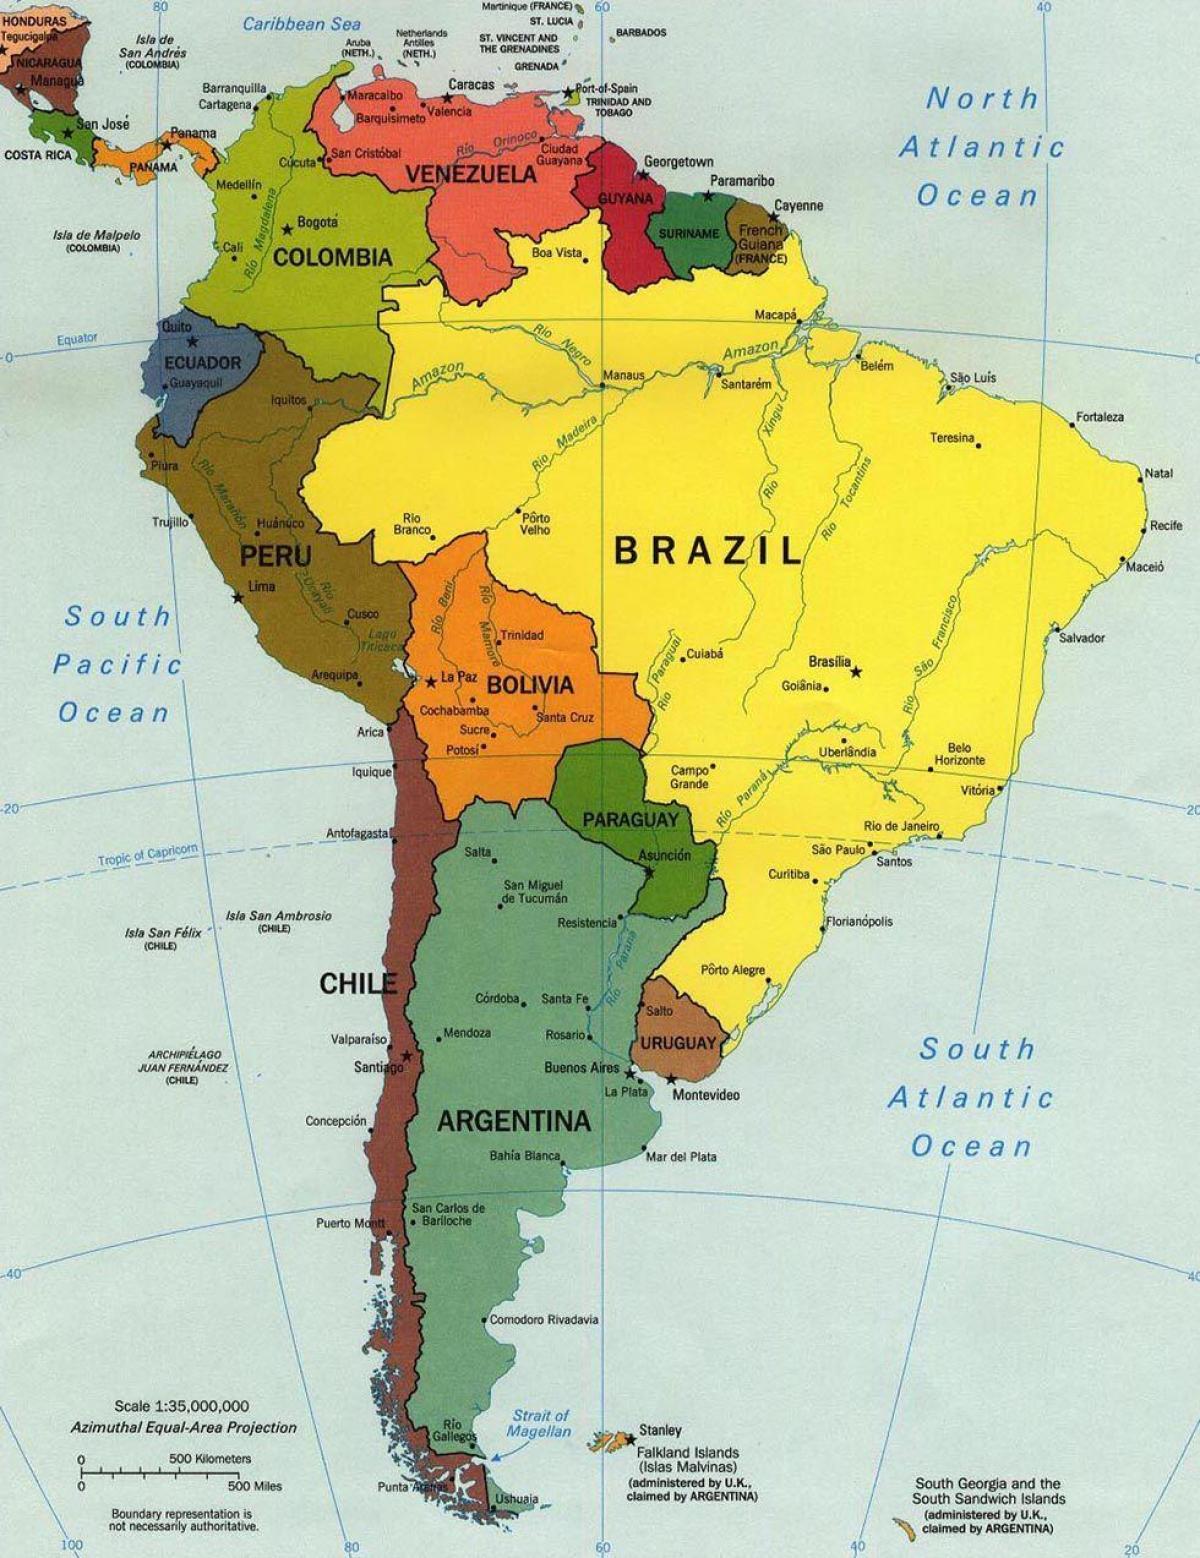 brasilia on etel amerikan kartan